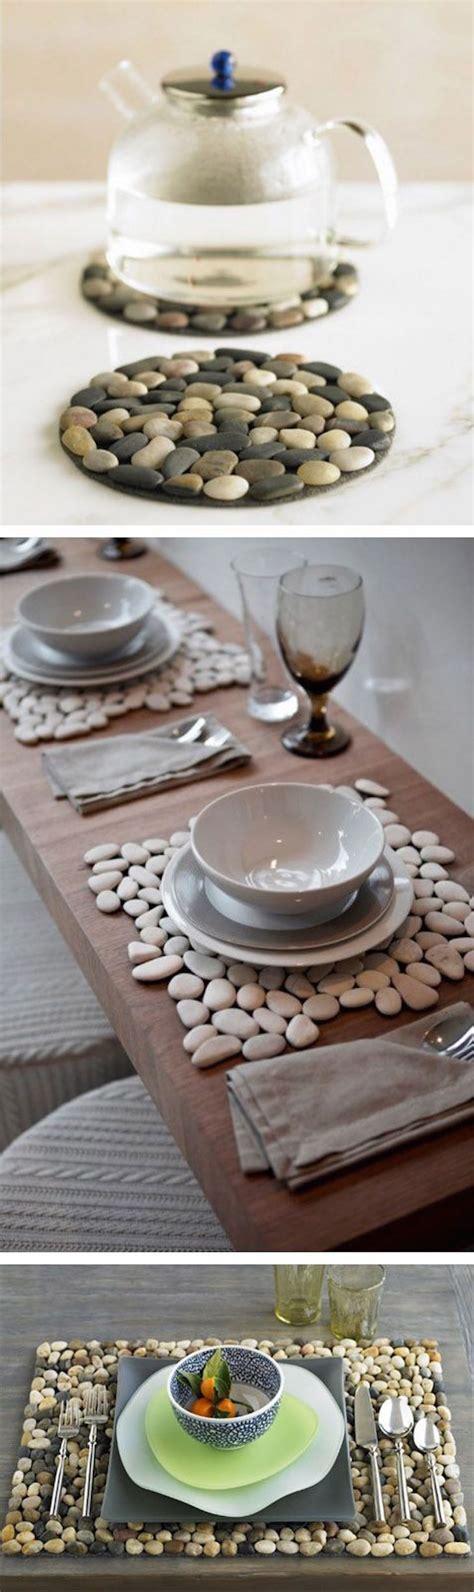 Inexpensive Home Decor Online 10 pebbles diy ideas image 9 diy amp crafts ideas magazine